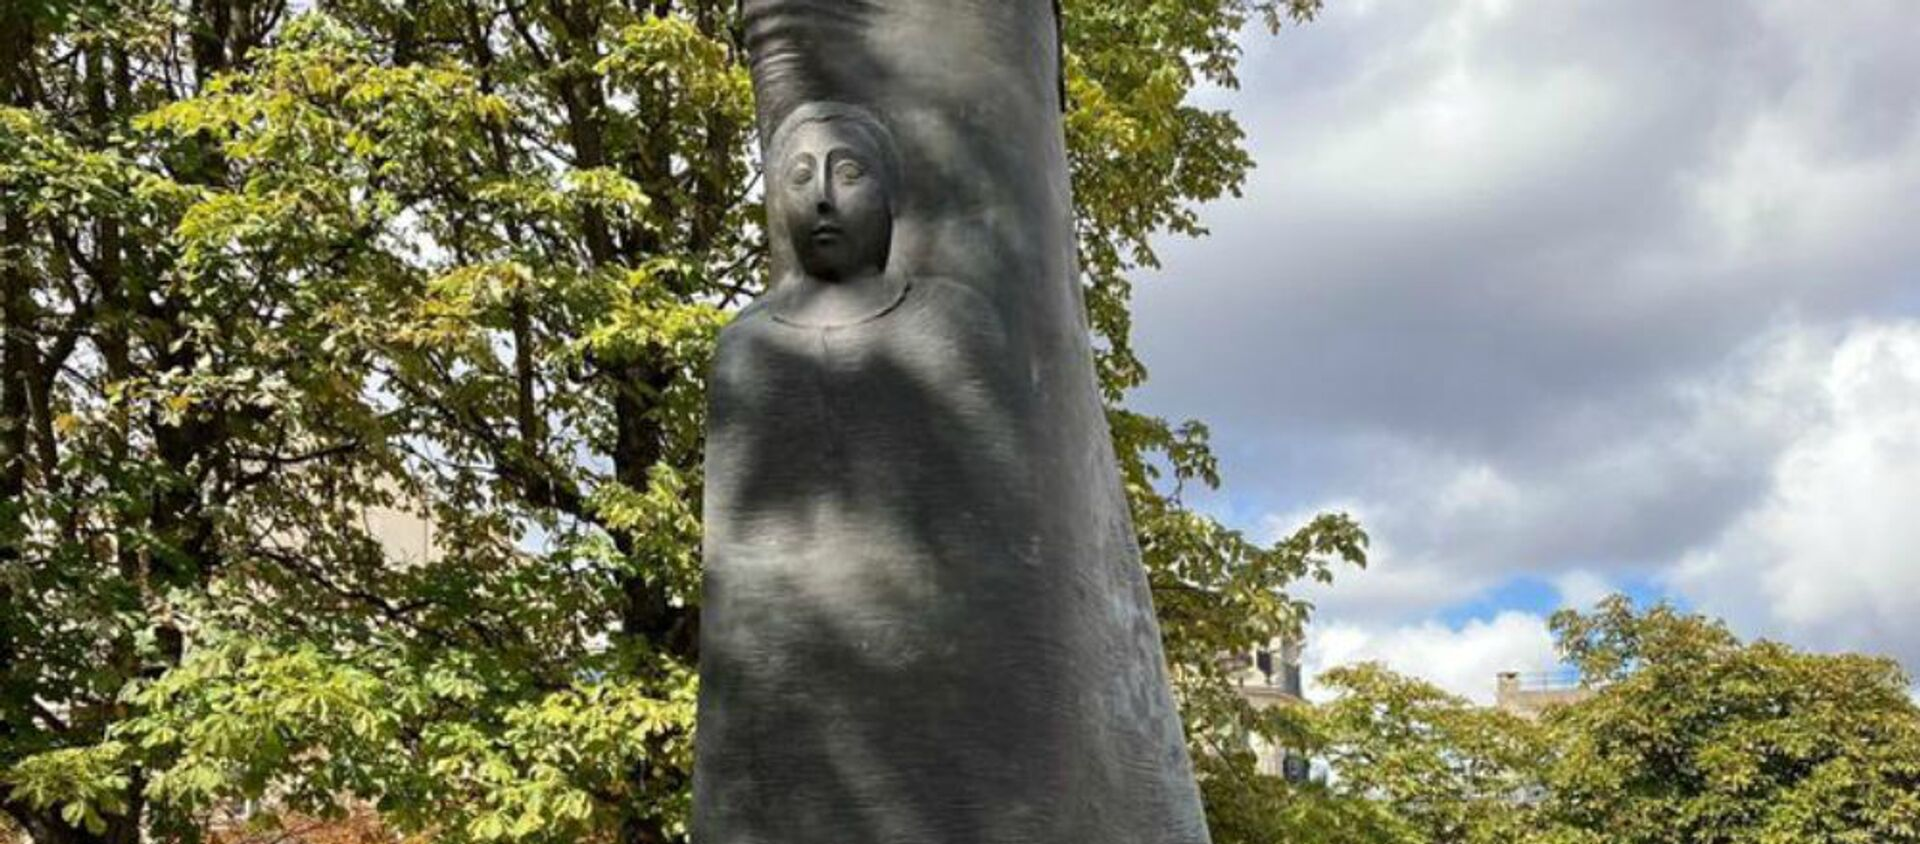 Оскверненная статуя Комитаса в Париже (30 августа 2020). - Sputnik Արմենիա, 1920, 31.08.2020